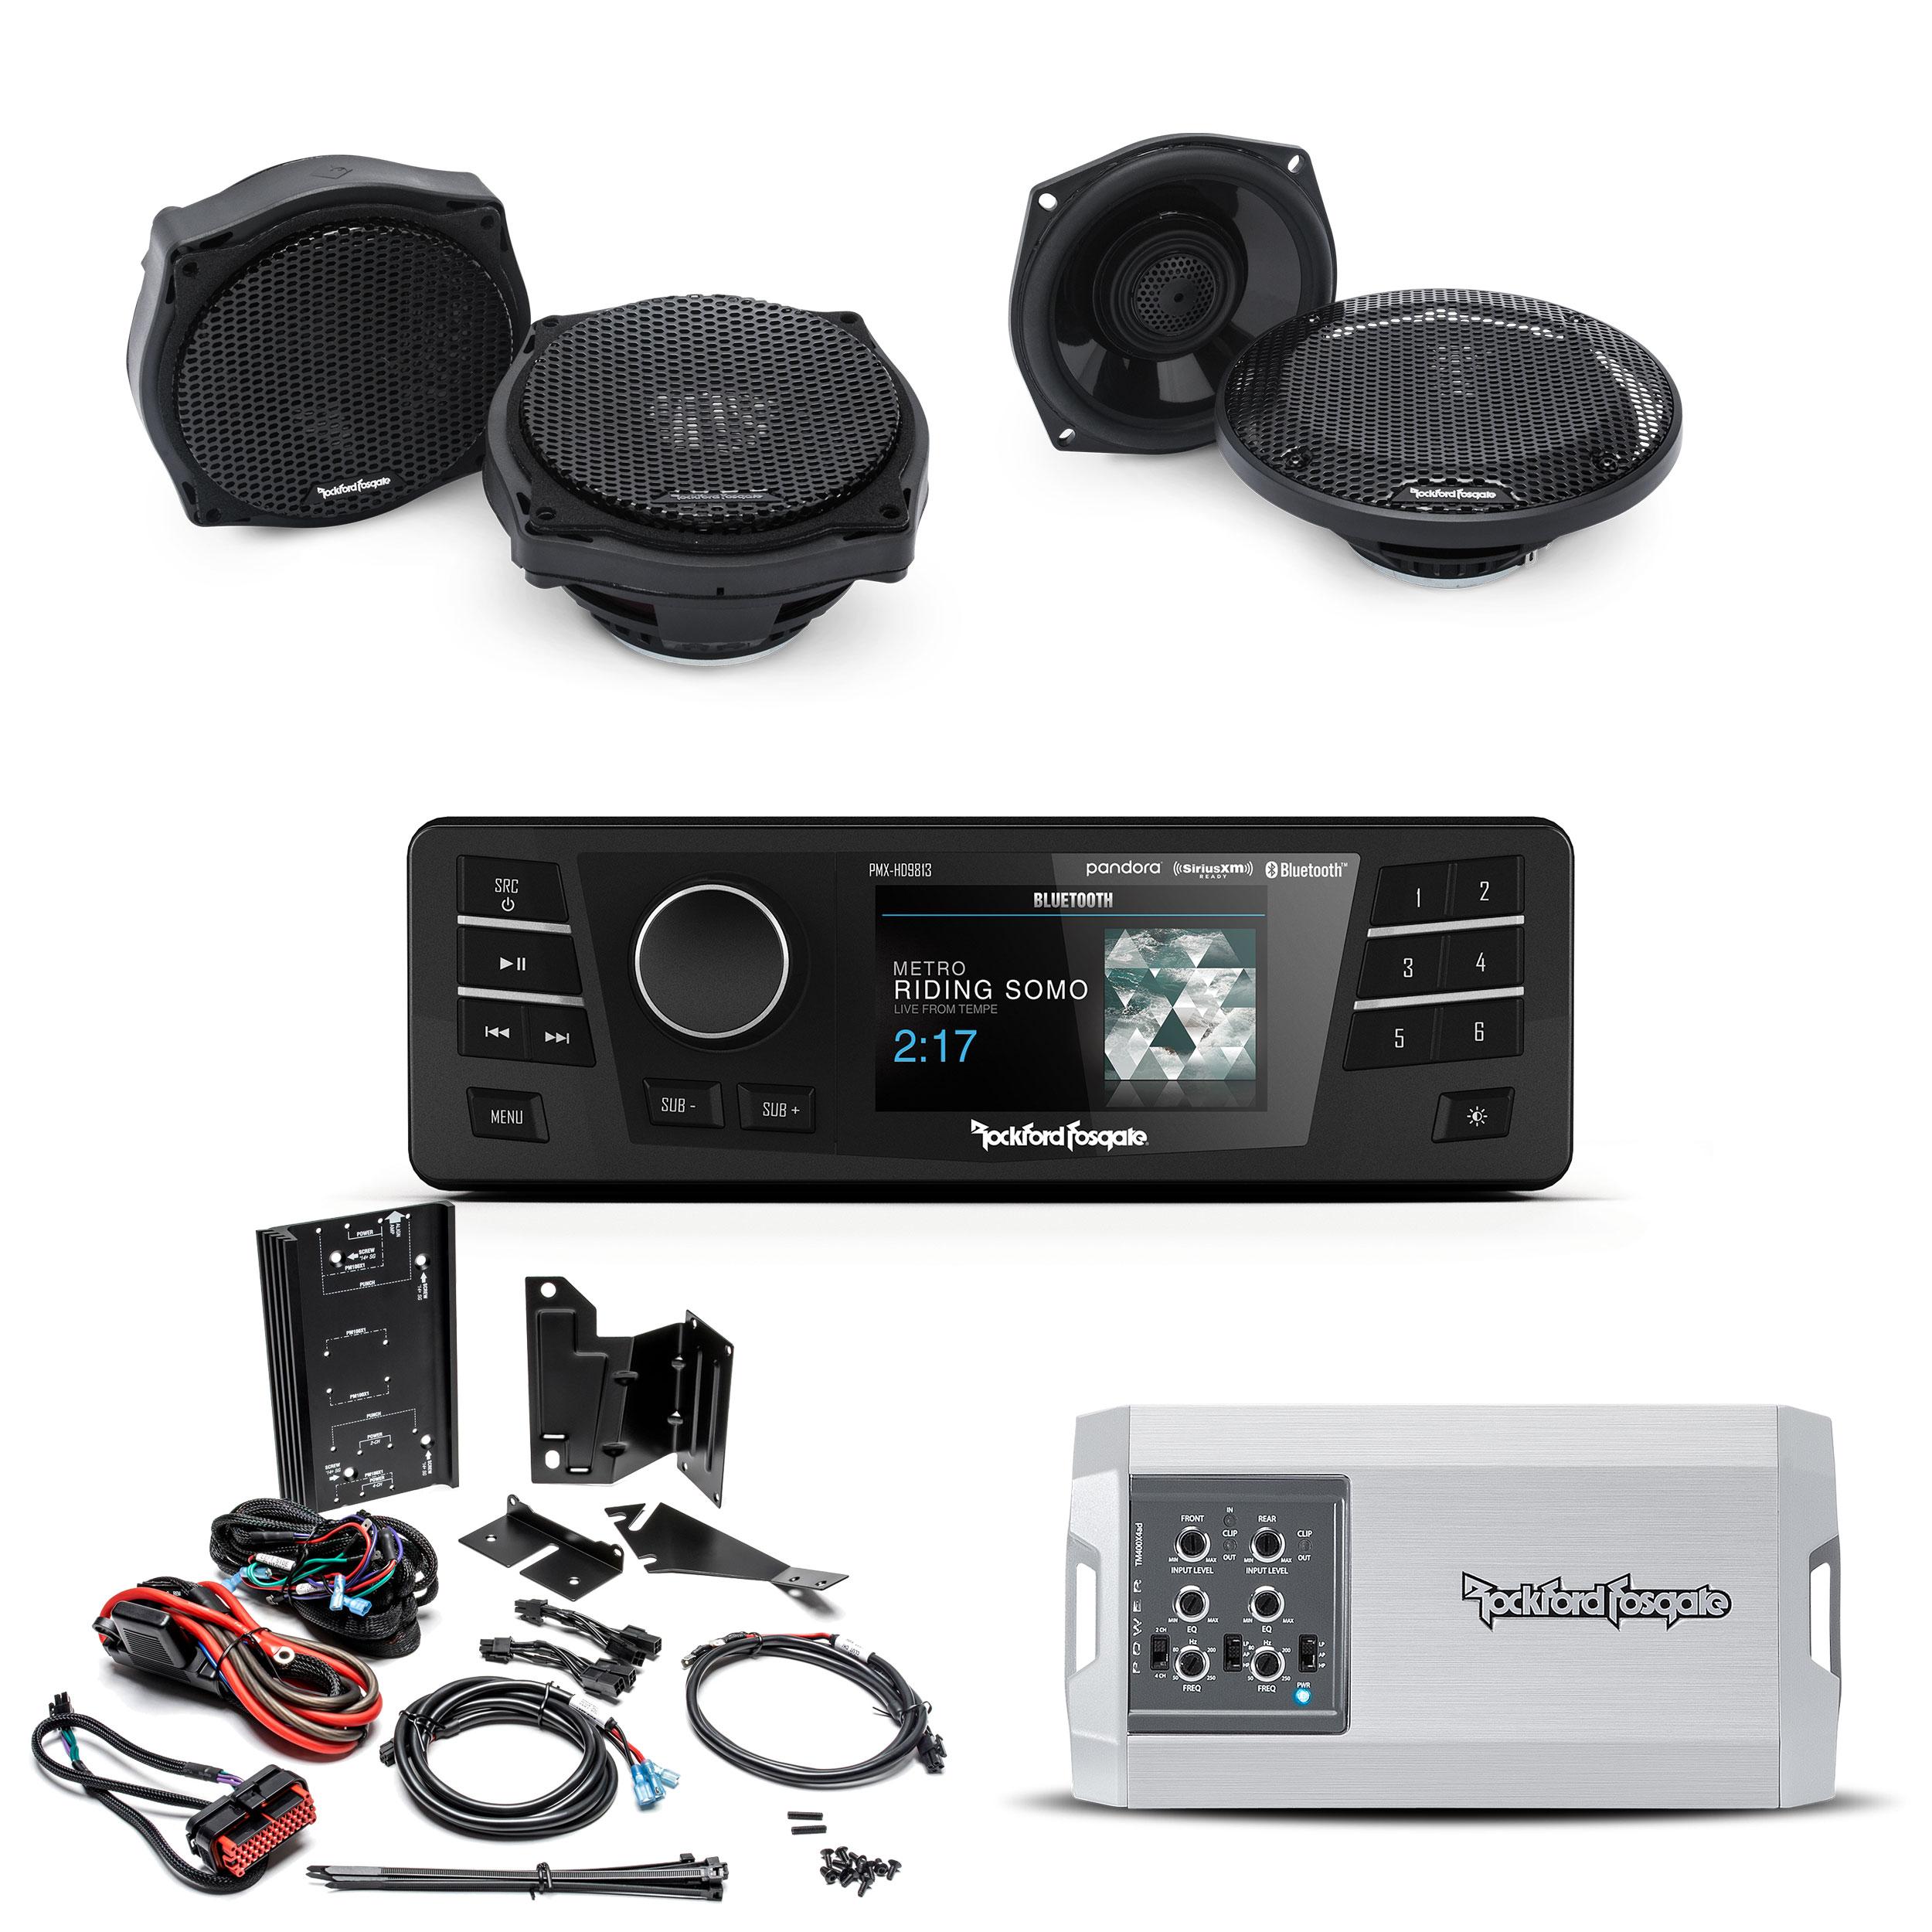 Four Speakers /& Amplifier Kit for 1998-2013 Harley-Davidson Road Glide Rockford Fosgate HD9813RG-STAGE3 Digital Media Receiver